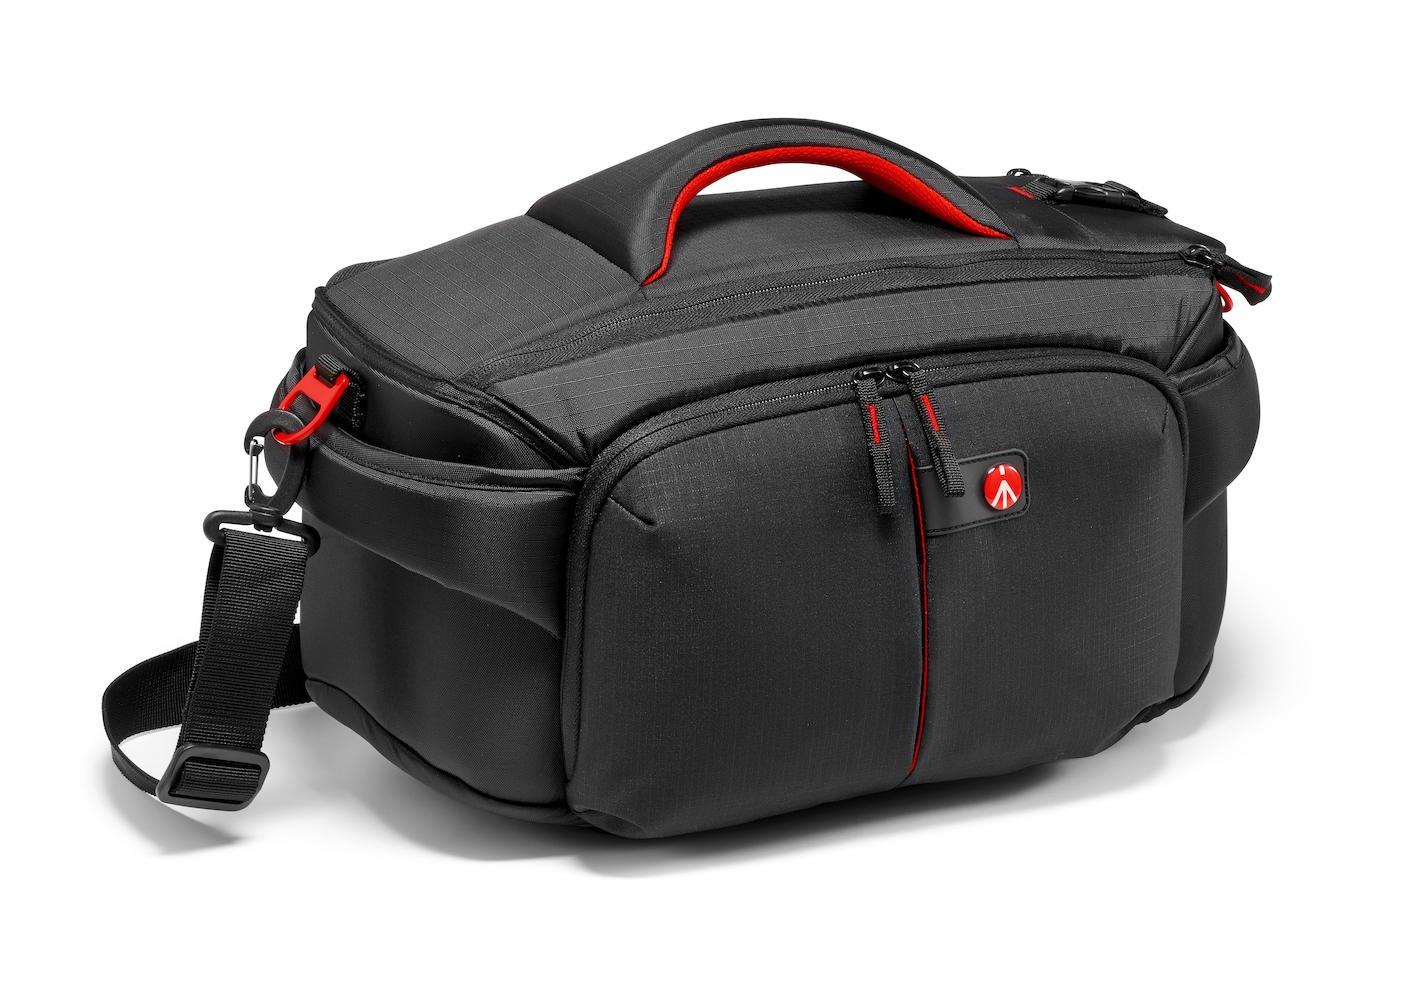 Manfrotto Pro Light Video Camera Bag, Black, Compact (MB PL-CC-191N)